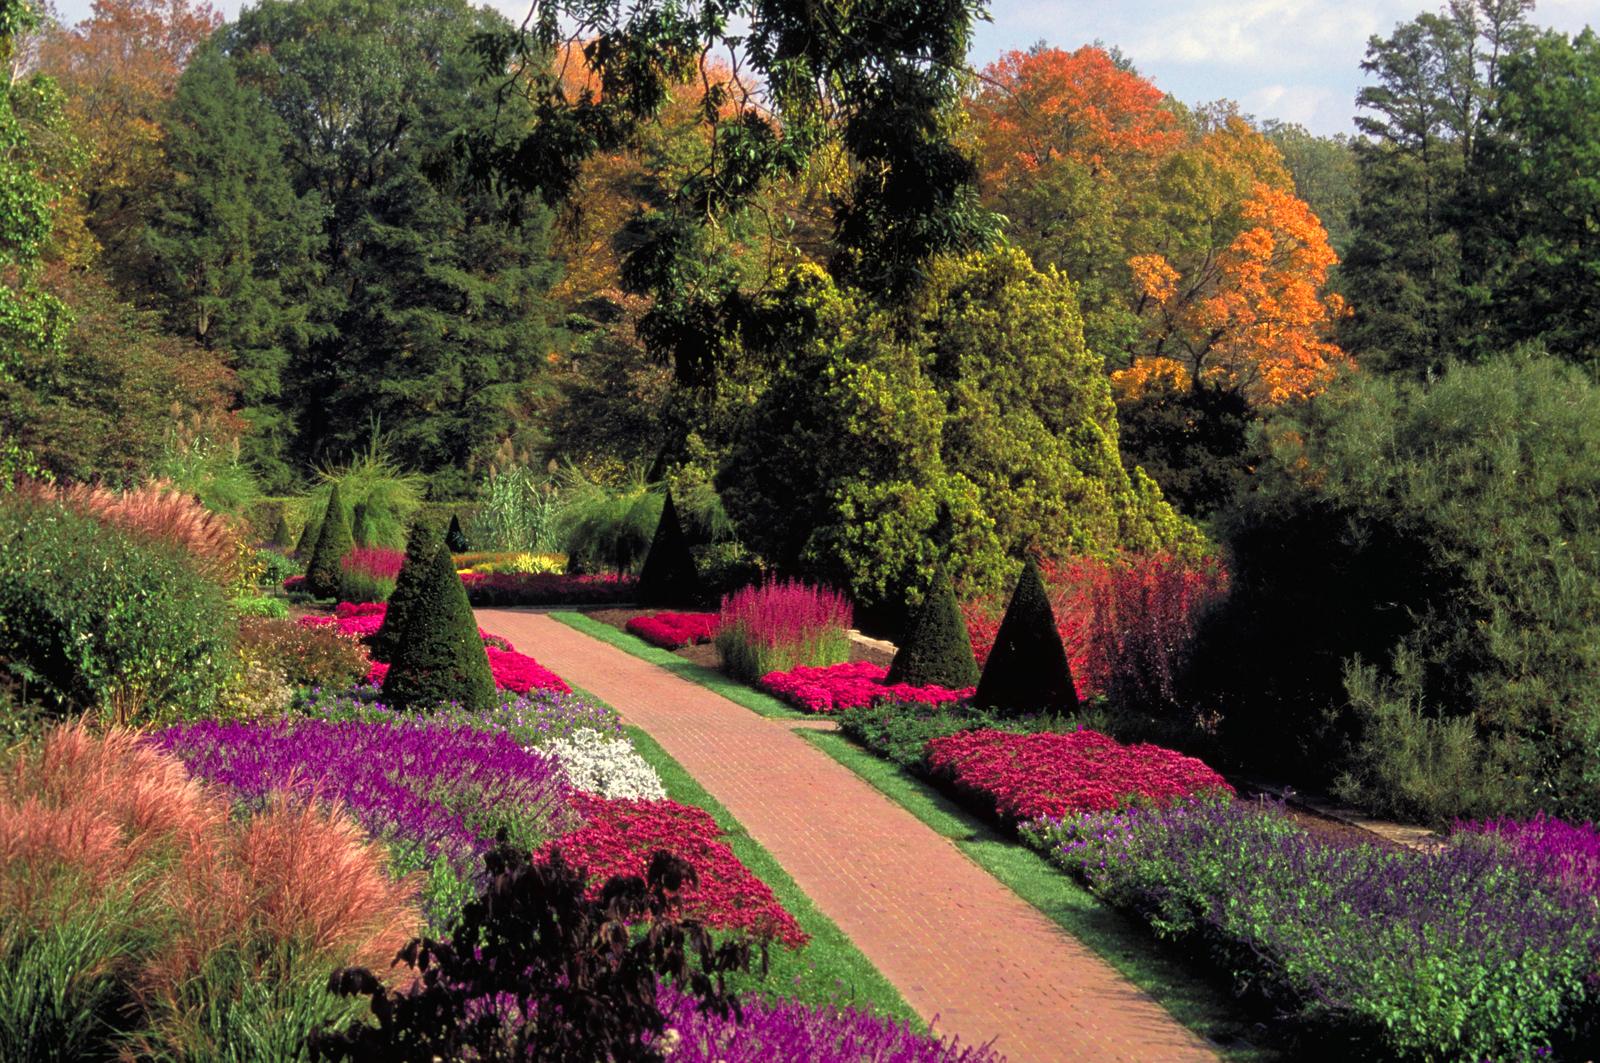 Brandywine Valley Scenic Byway - Autumn Walk in the Longwood Gardens